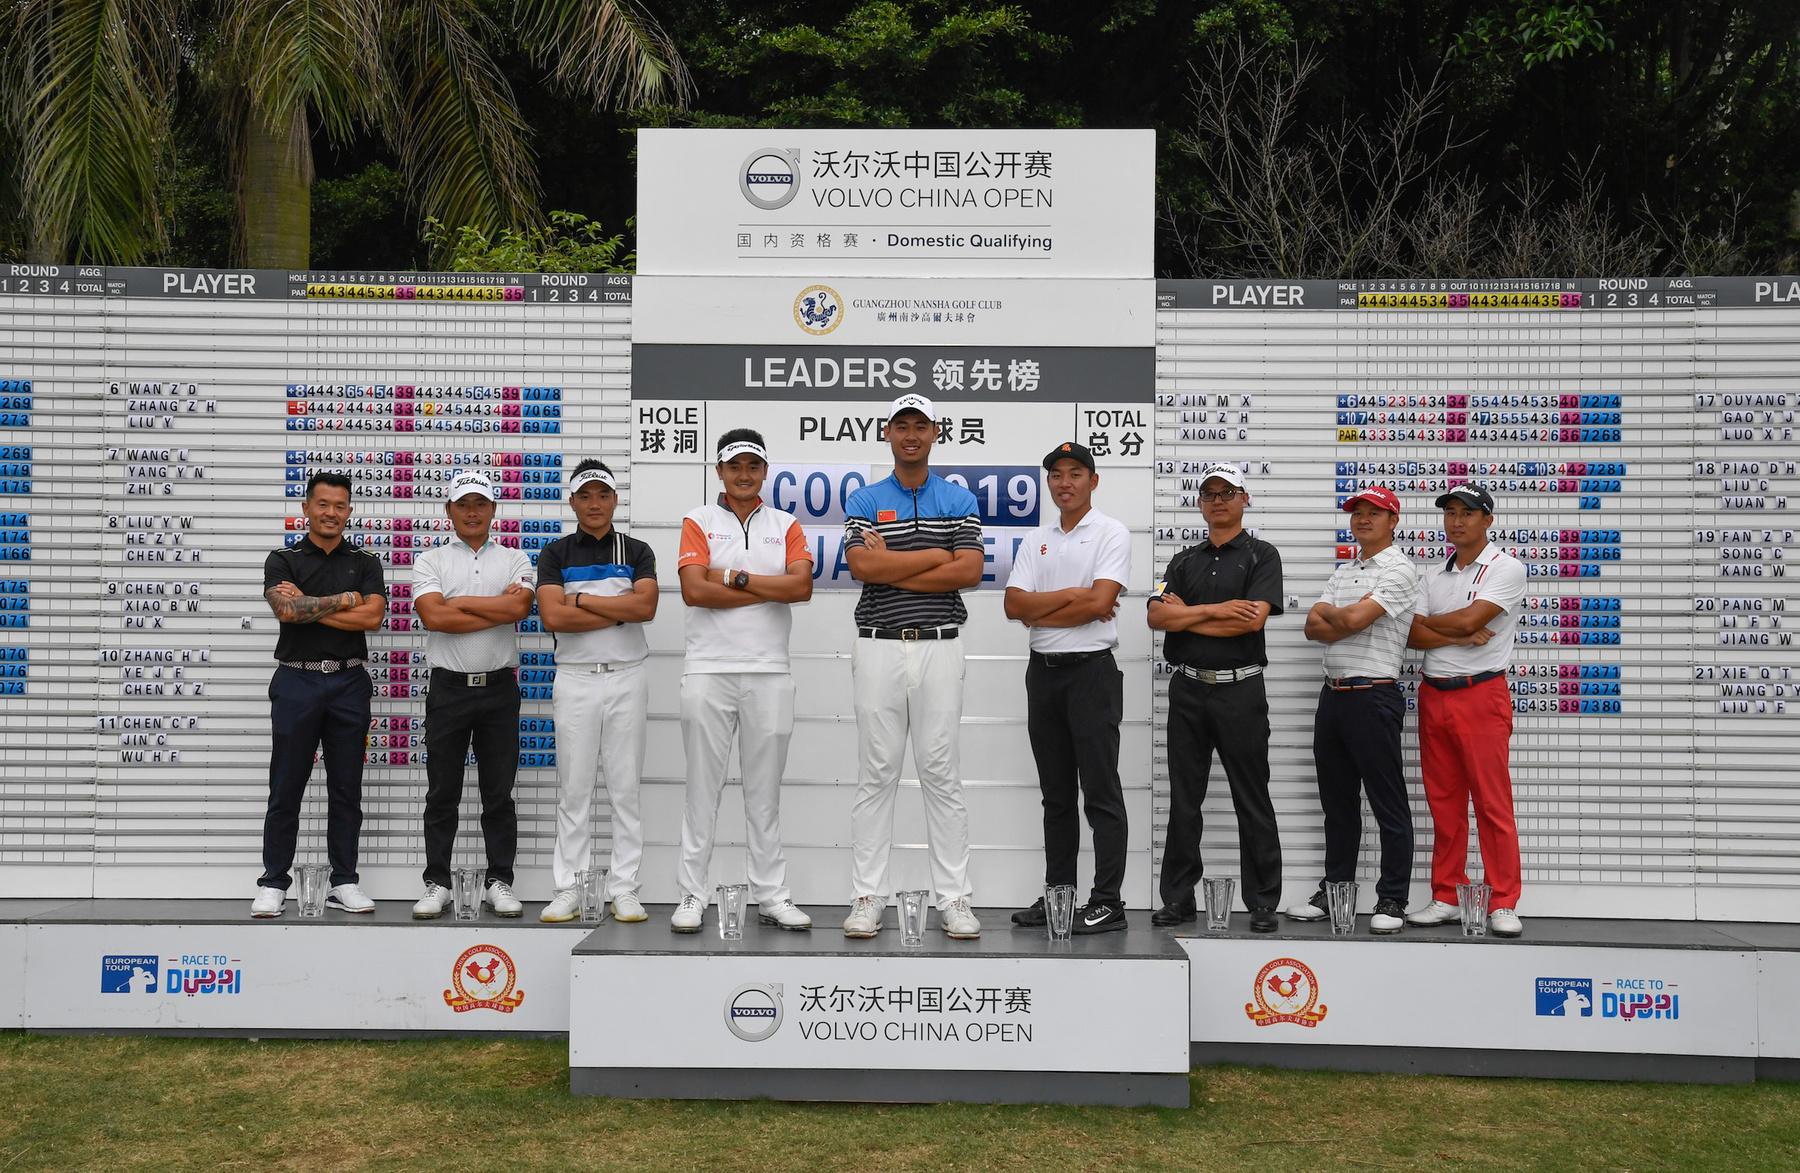 Volvo China Open Domestic Qualifying 2019